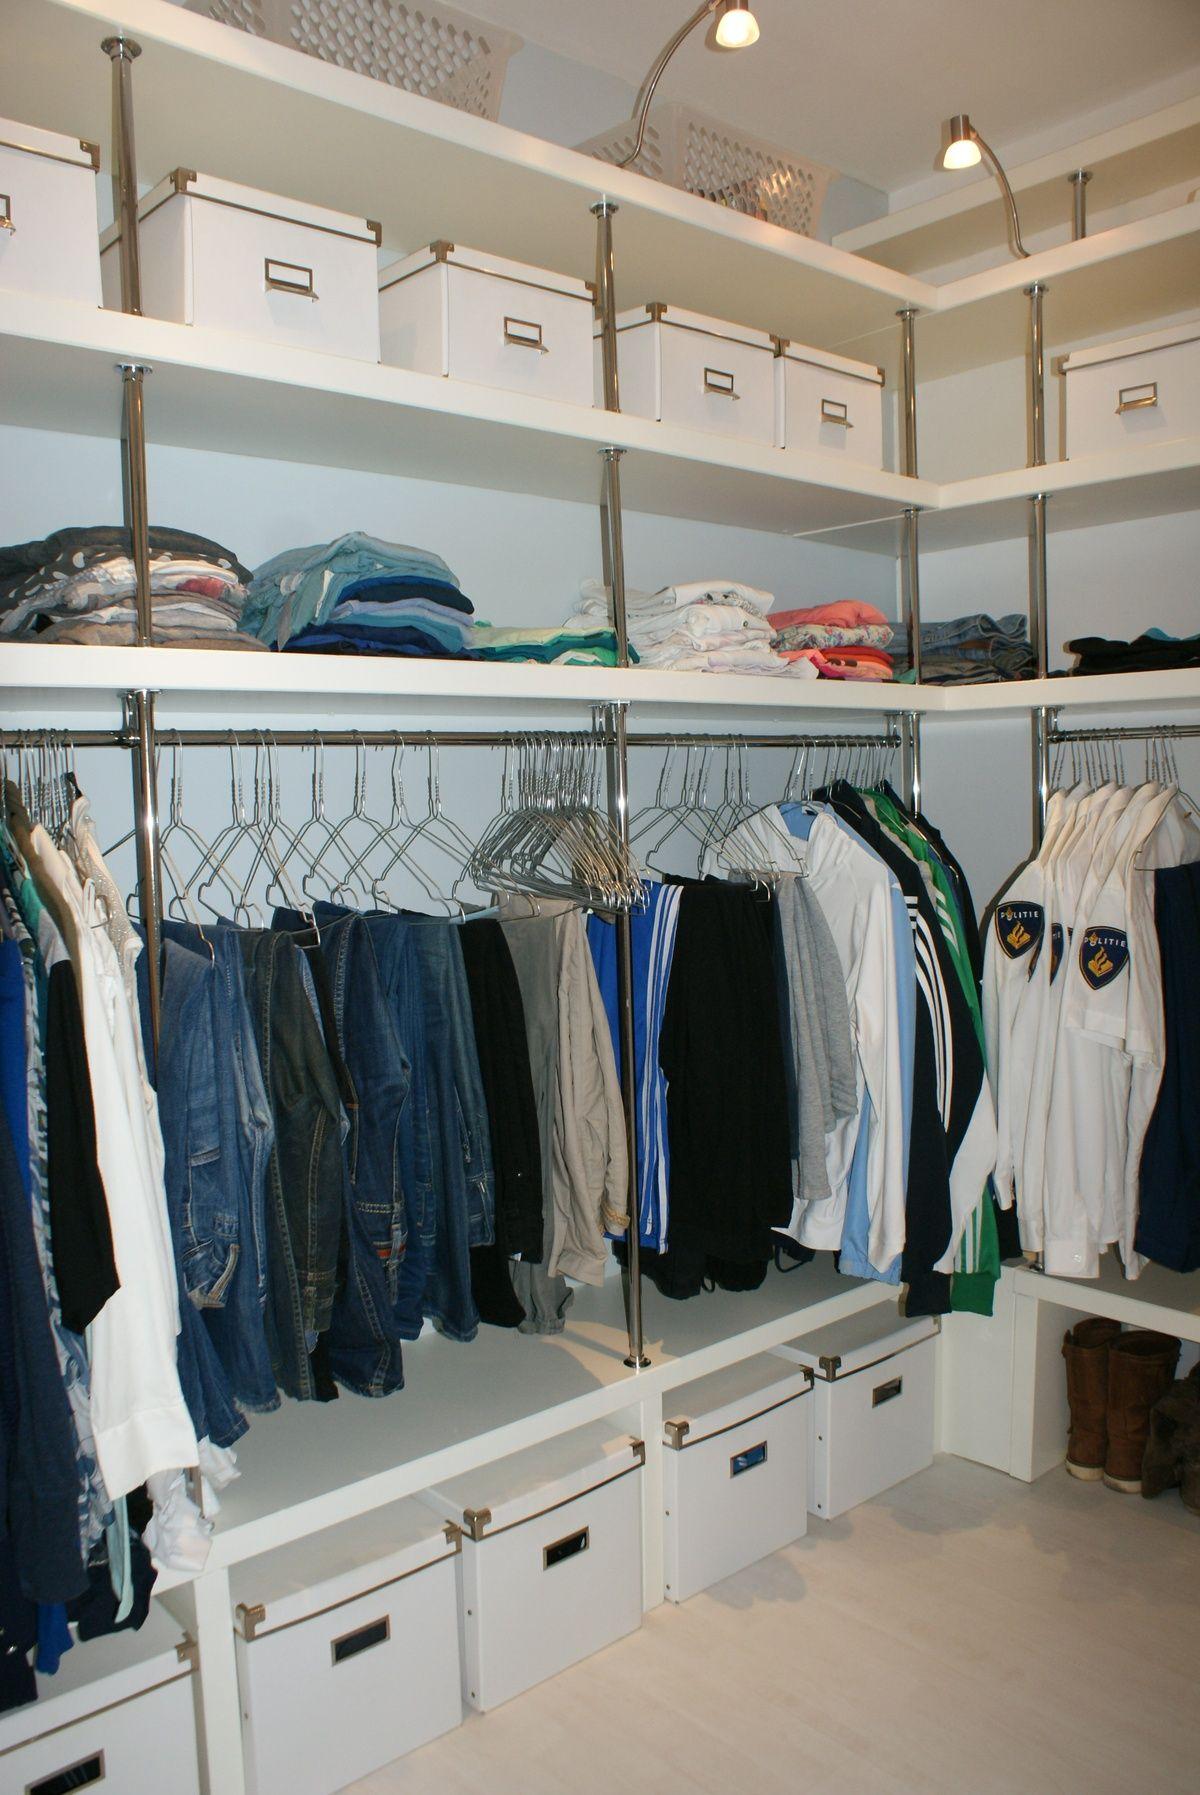 Pin by paula beard on house | Dressing room closet, Closet ...